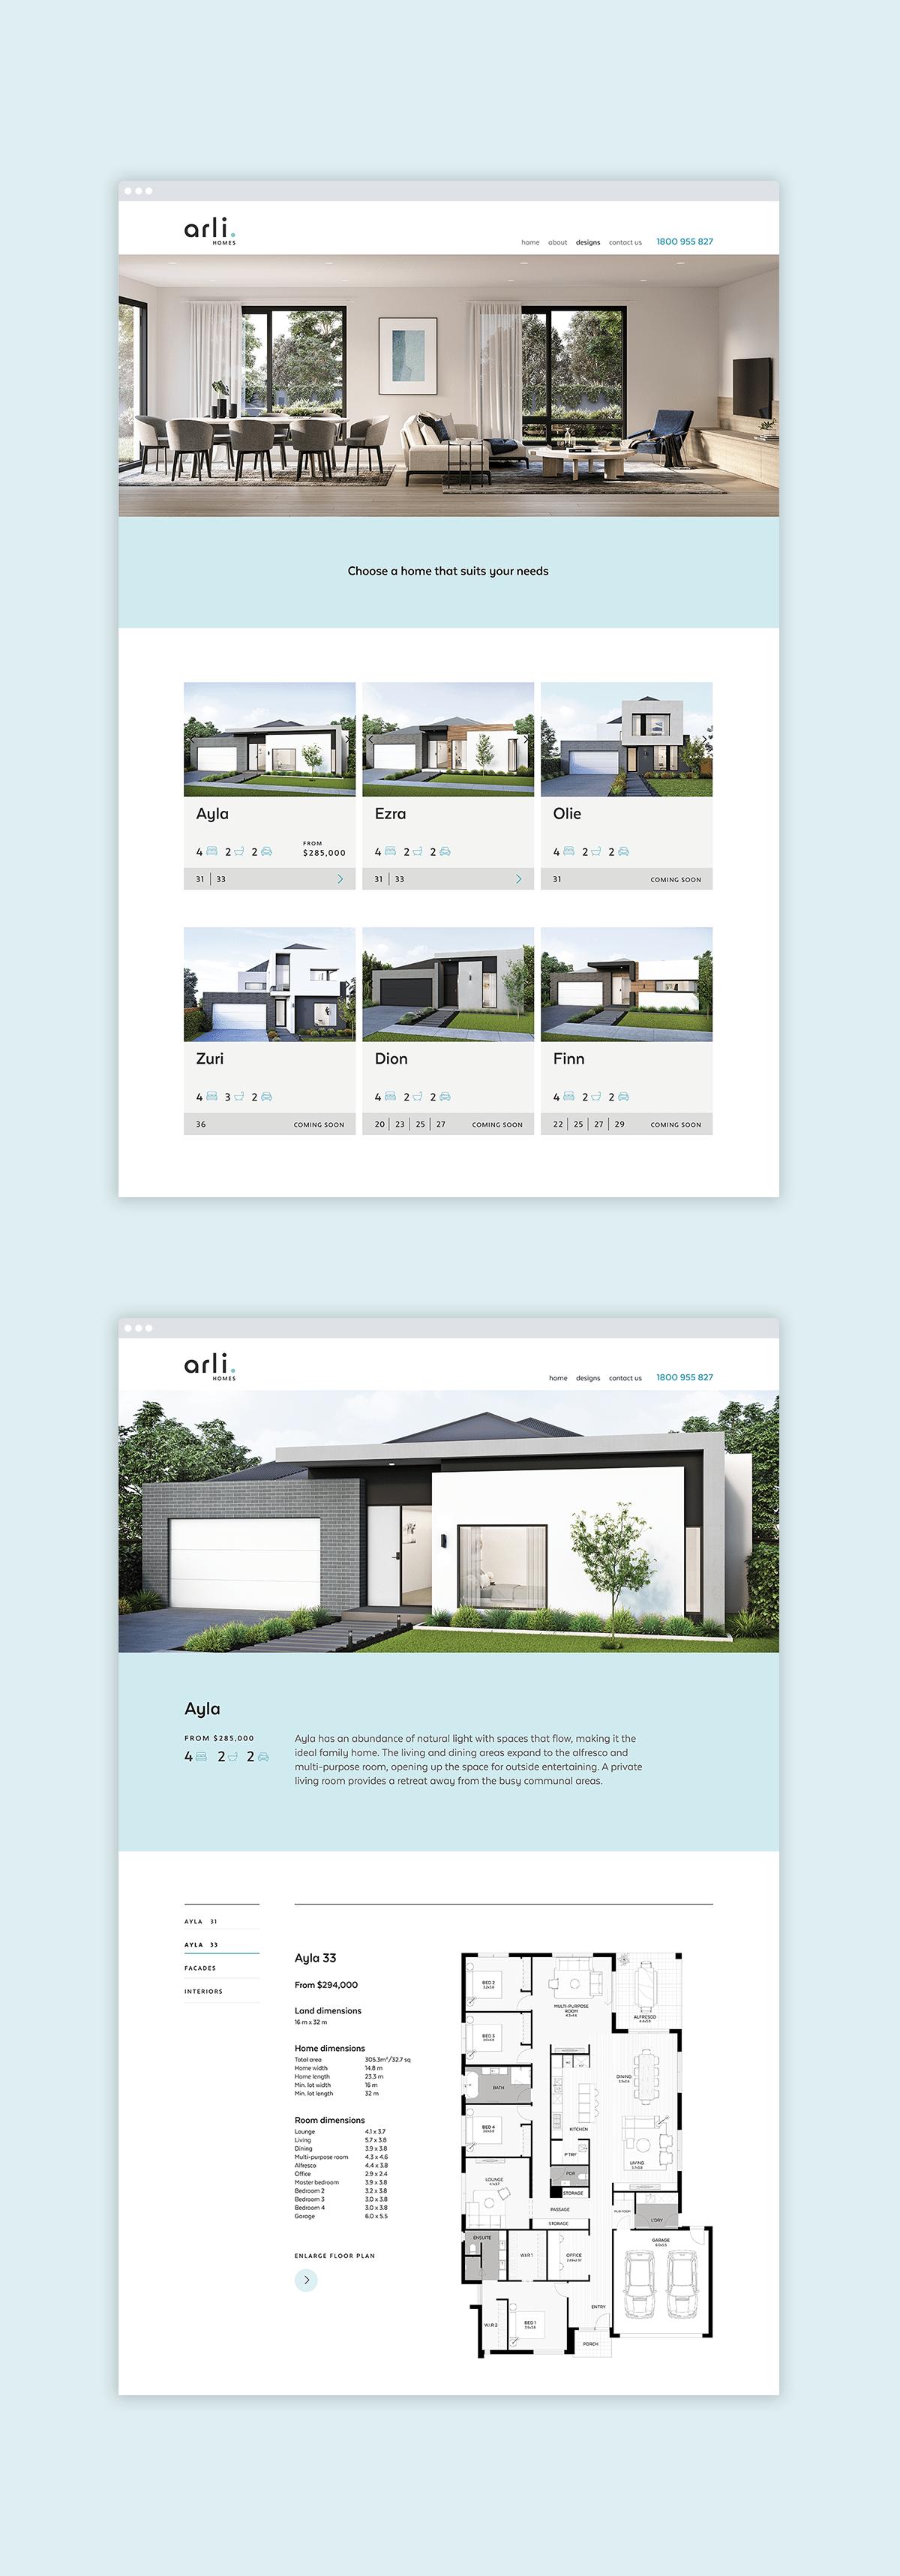 Arli Homes Design